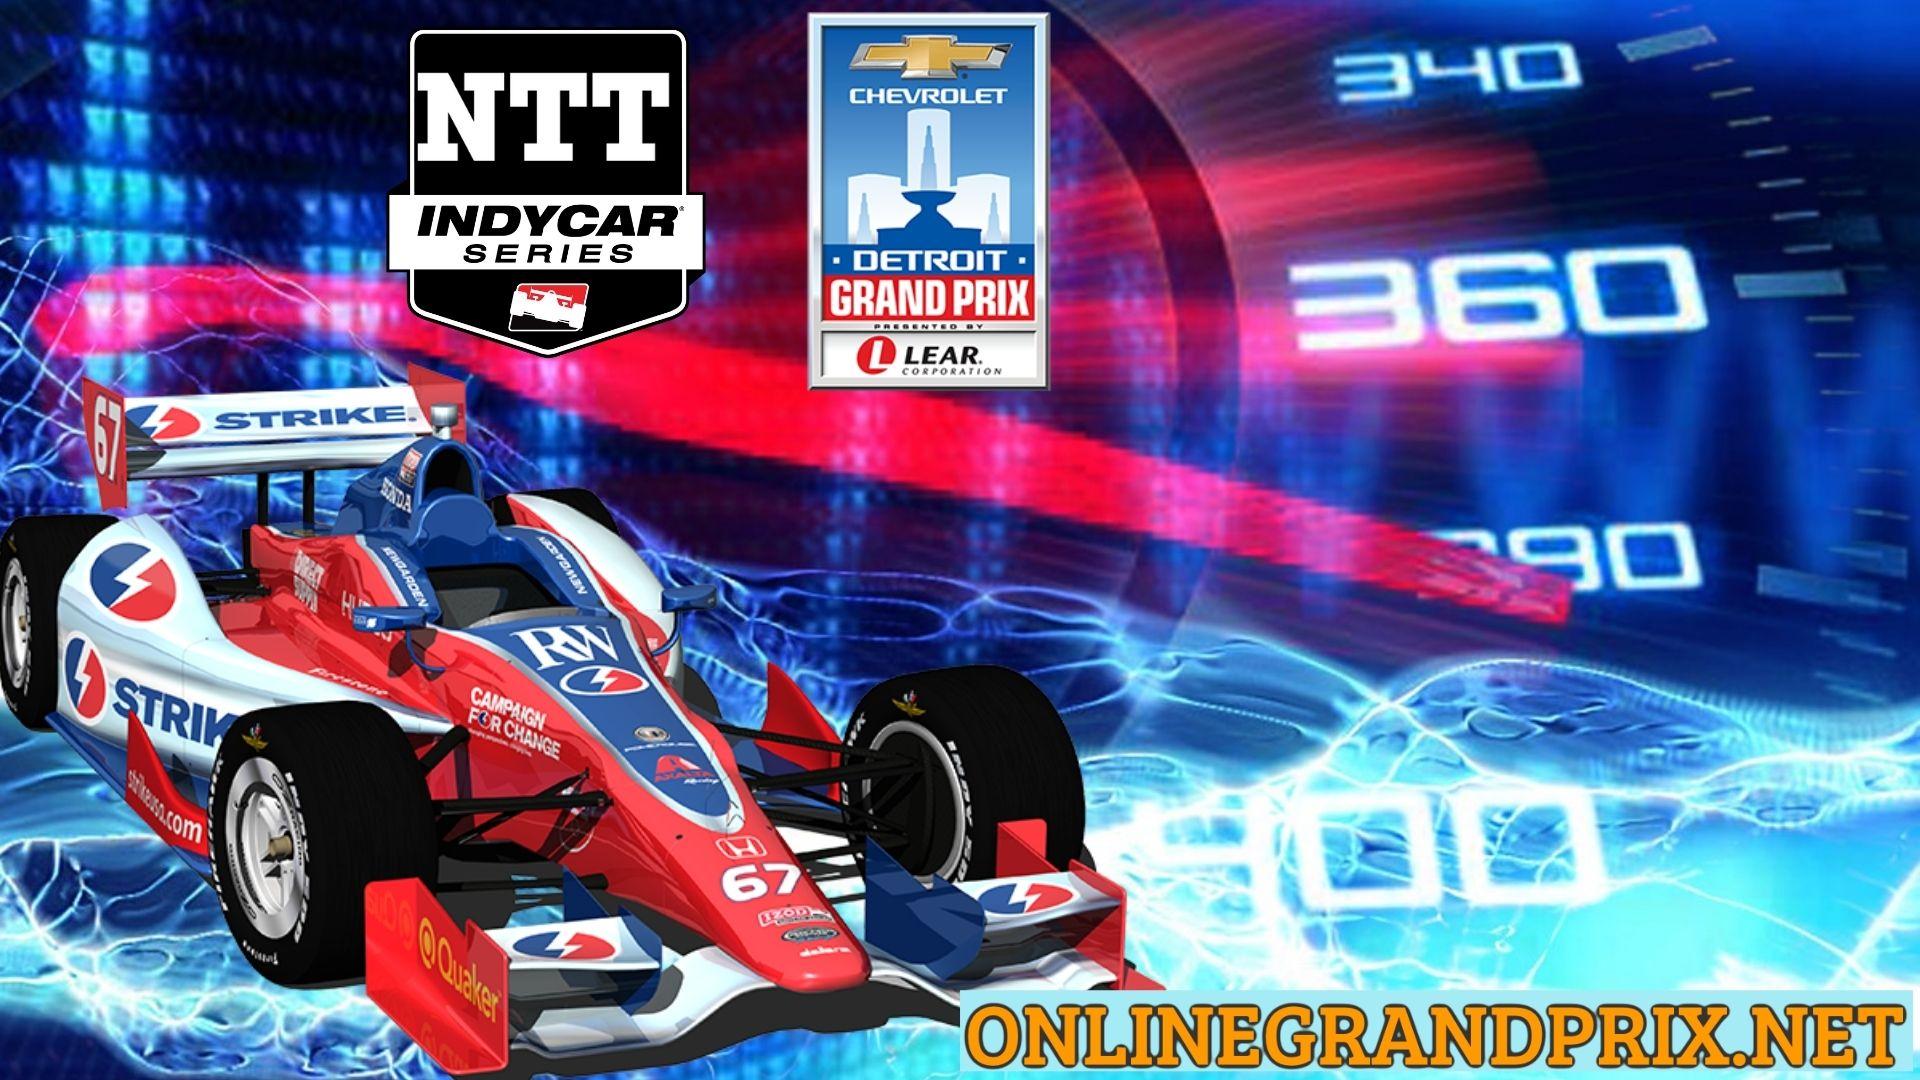 Chevrolet Detroit Grand Prix IndyCar Live Stream